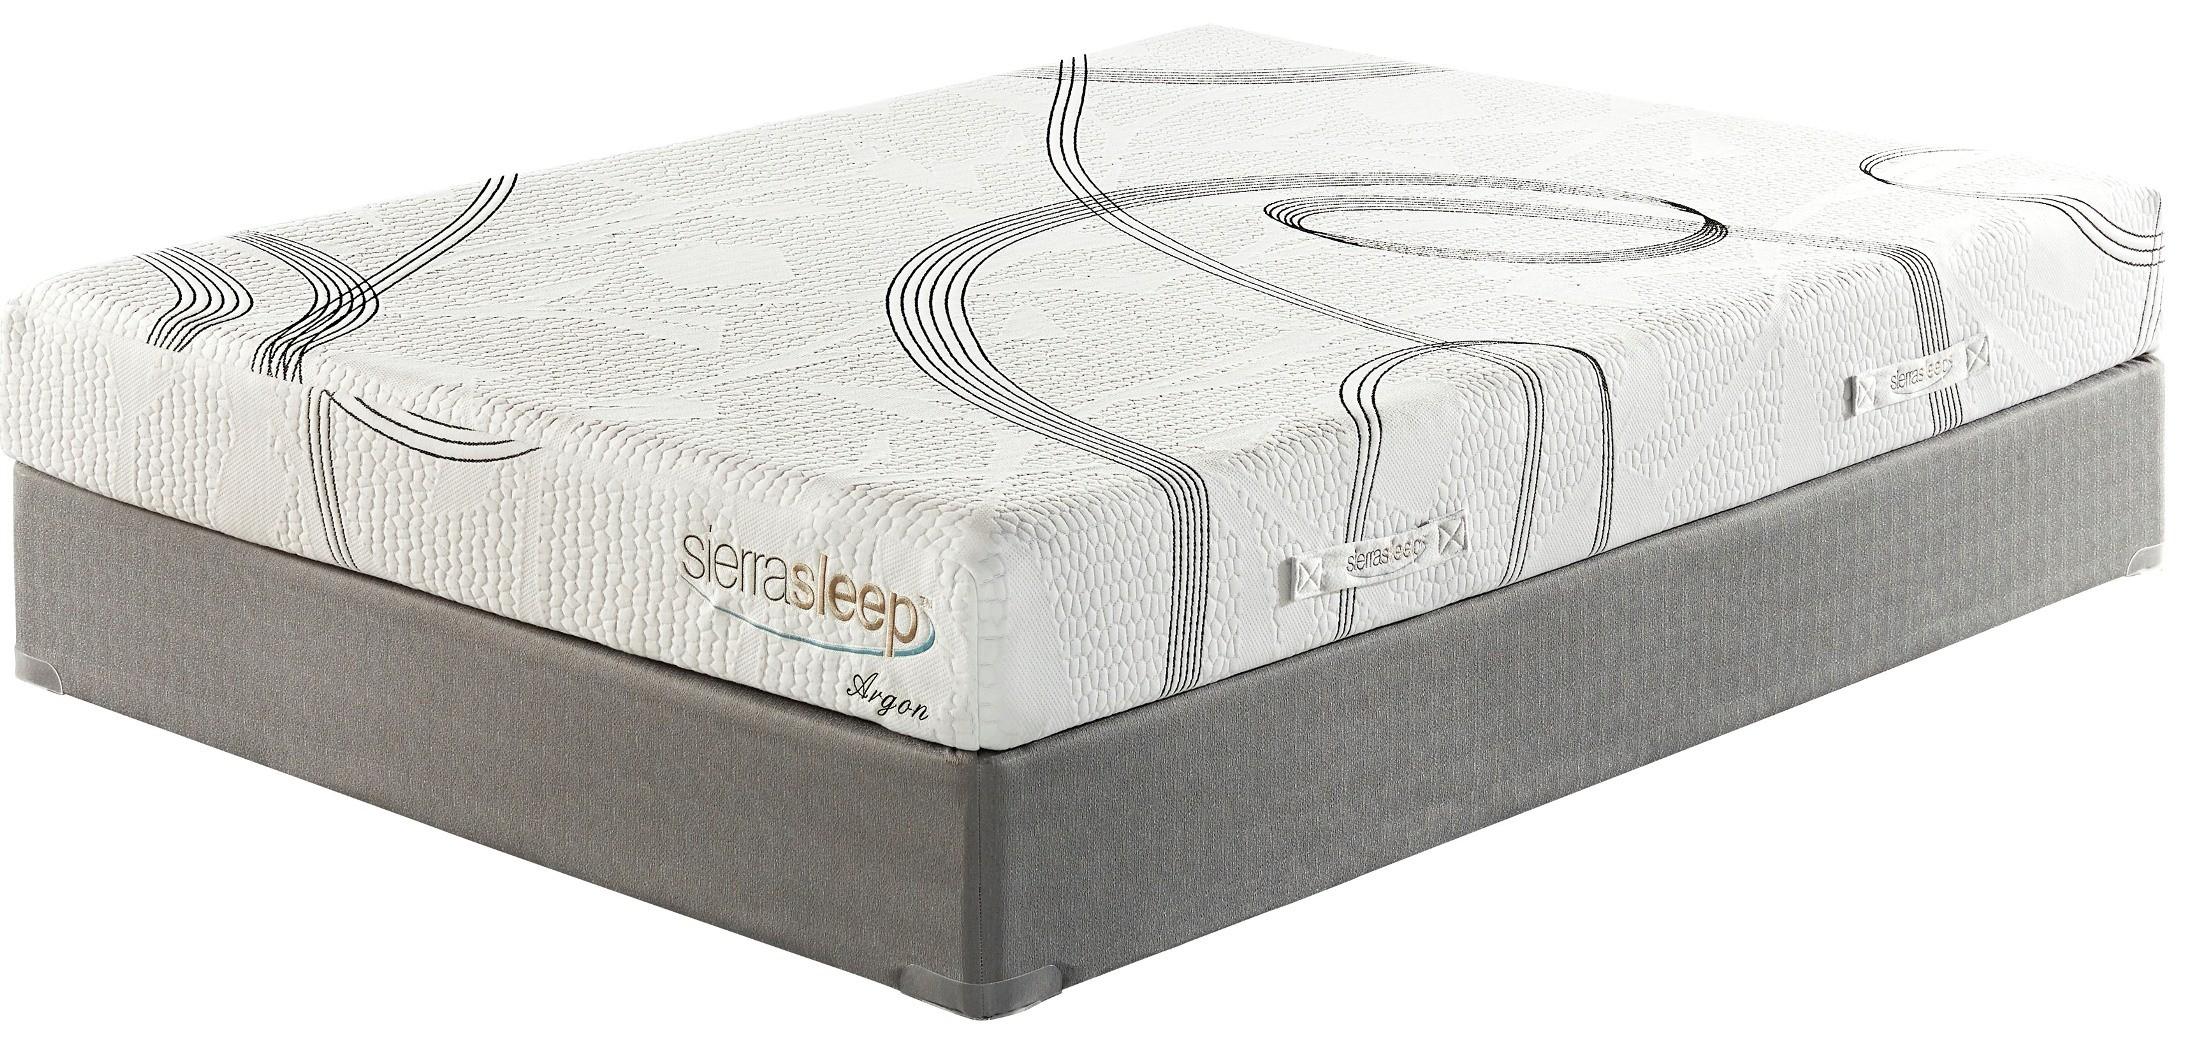 8 Series Queen Size Memory Foam Mattress M99031 Ashley Furniture